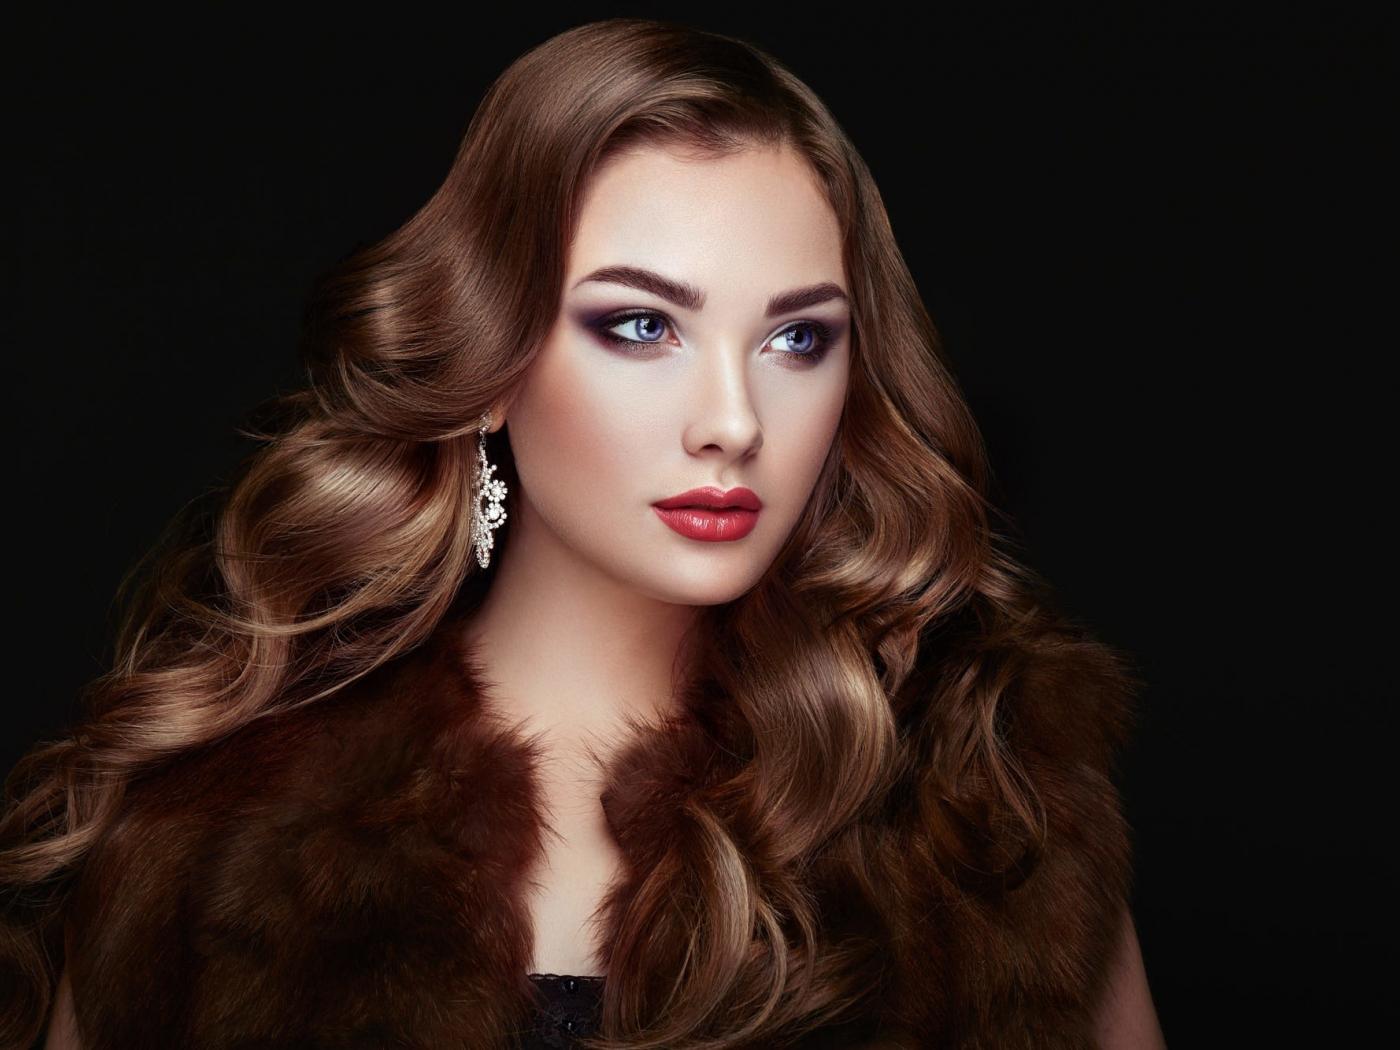 Download 1400x1050 Wallpaper Juicy Lips Curly Hair Makeup Girl Model Standard 4 3 Fullscreen 1400x1050 Hd Image Background 2187